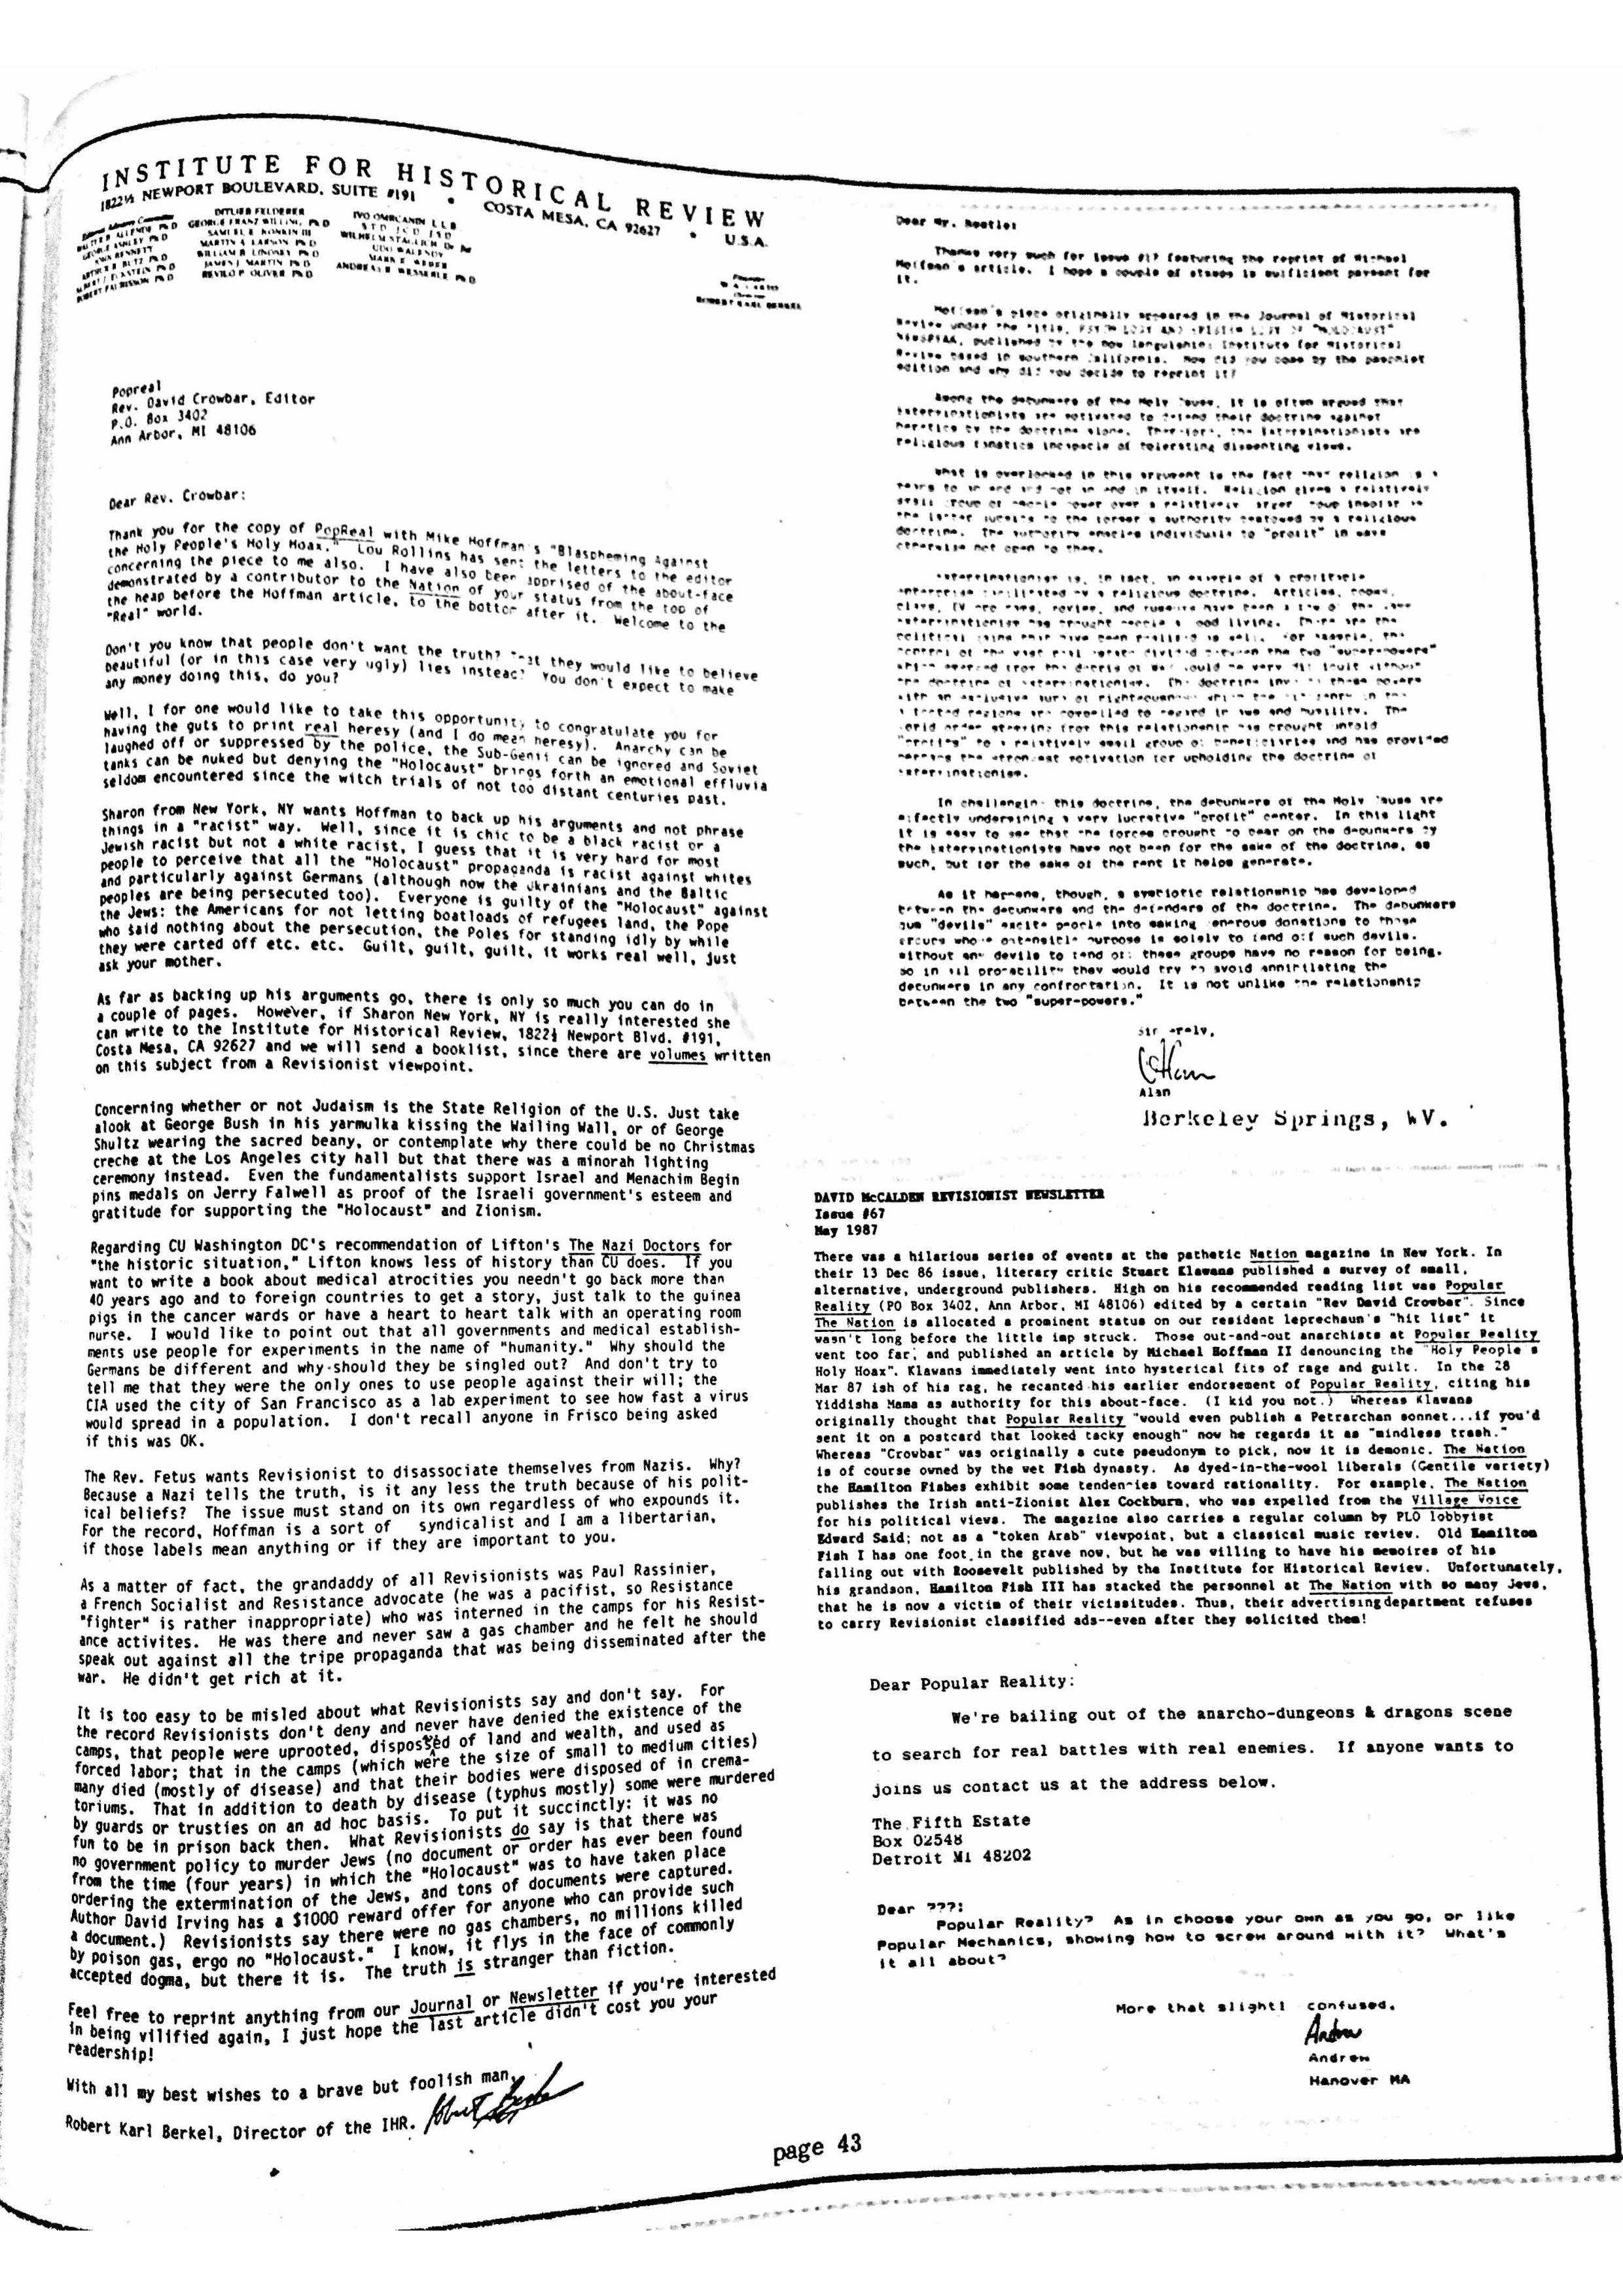 PopRealLast4-page-009.jpg